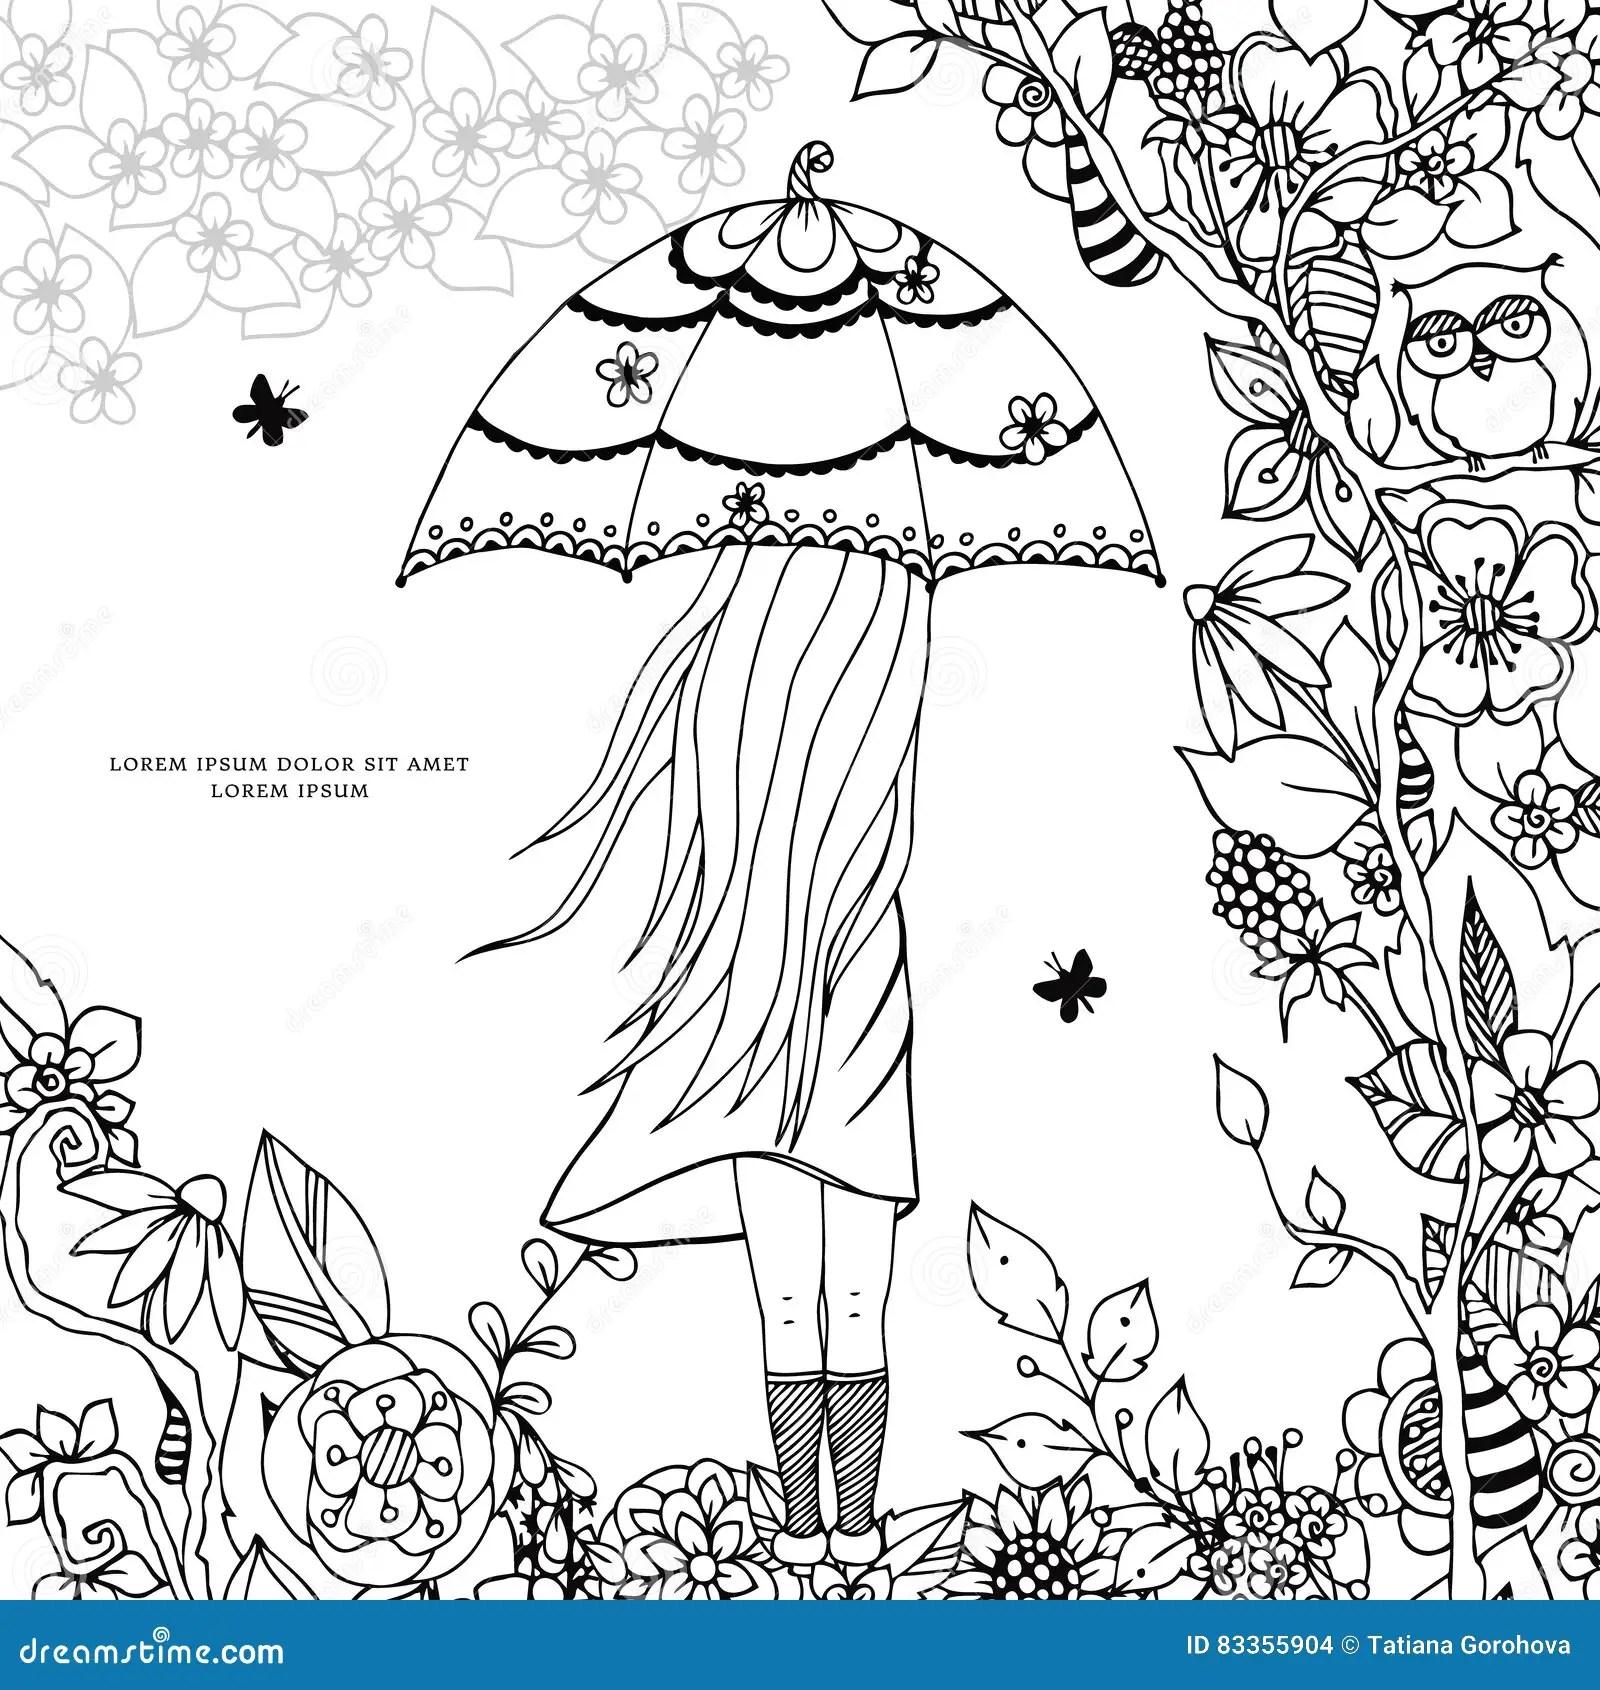 Vector Illustration Zen Tangle, A Girl With An Umbrella In